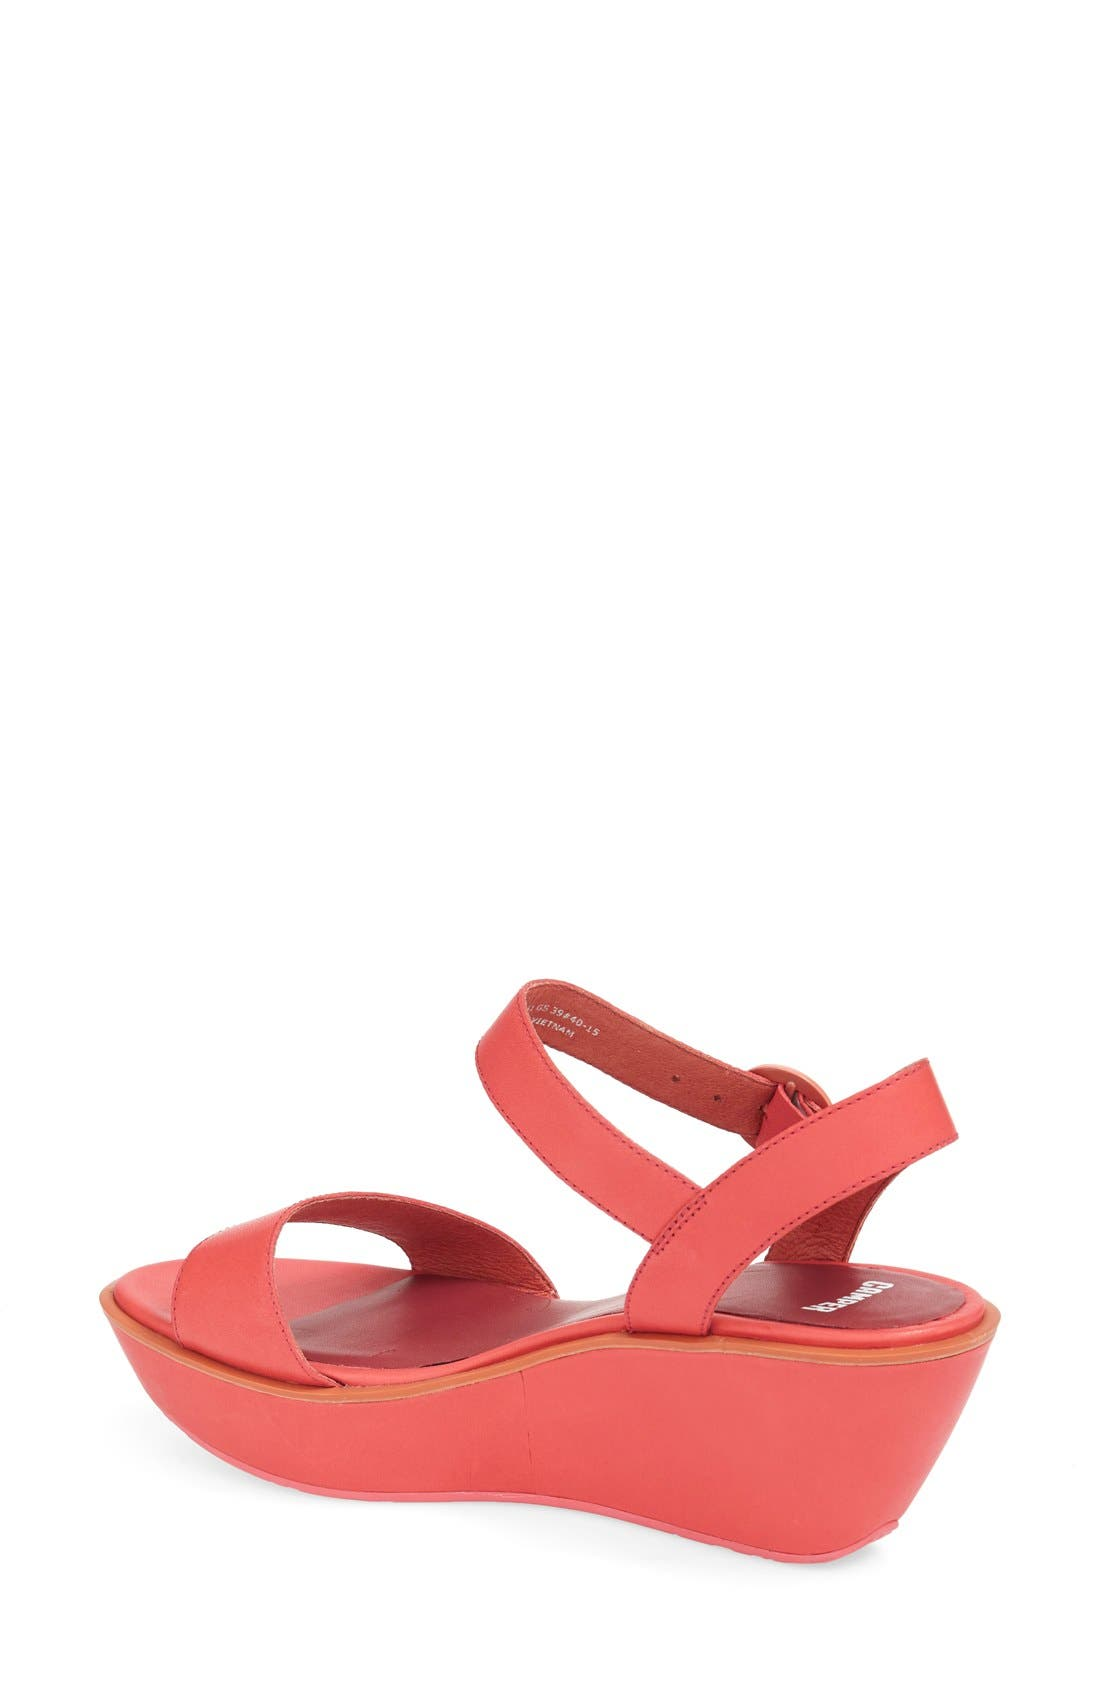 'Damas' Wedge Sandal,                             Alternate thumbnail 35, color,